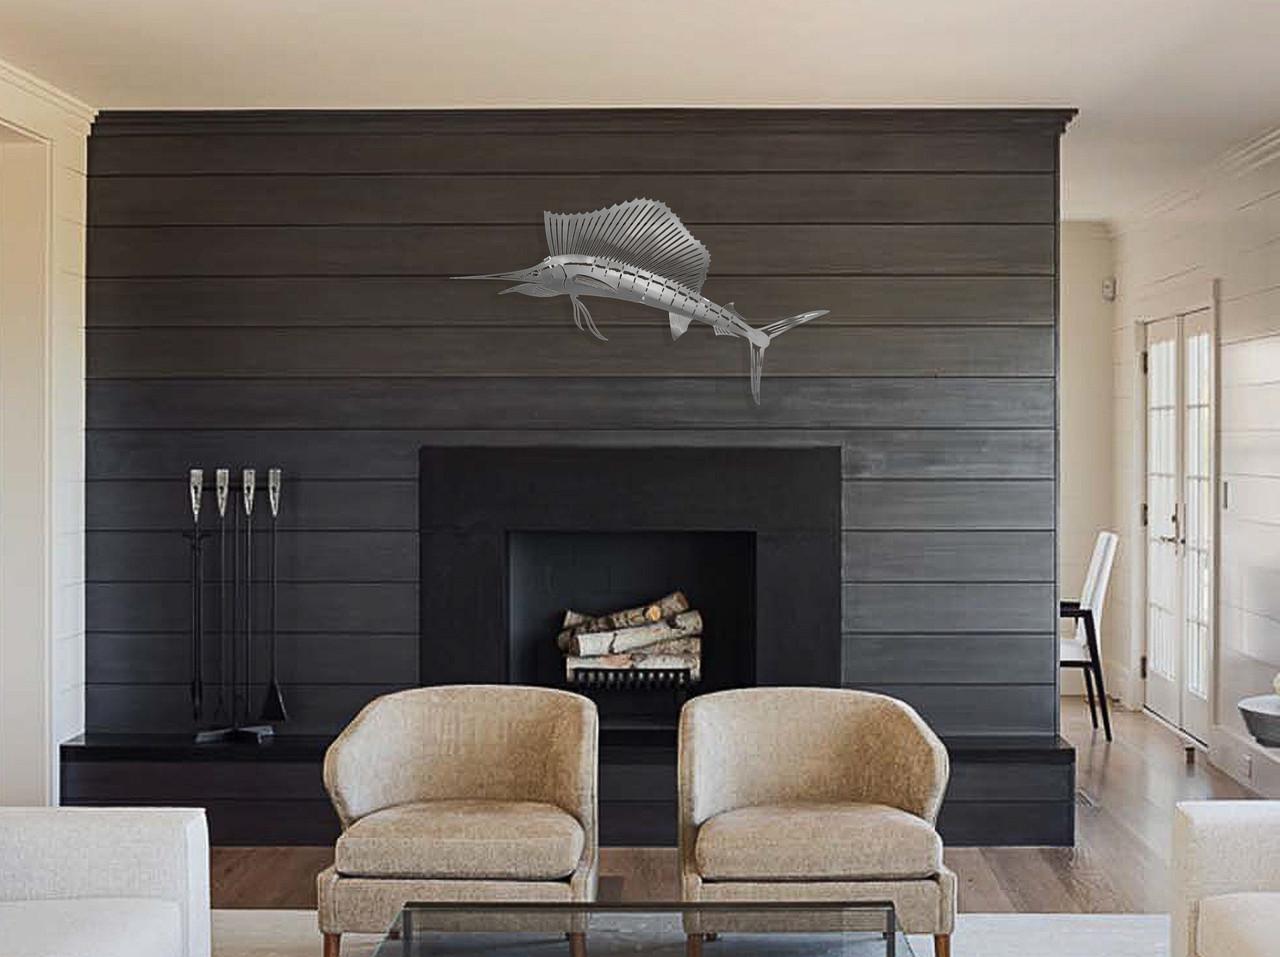 Sailfish Stainless Steel Wall Decor - Lifestyle